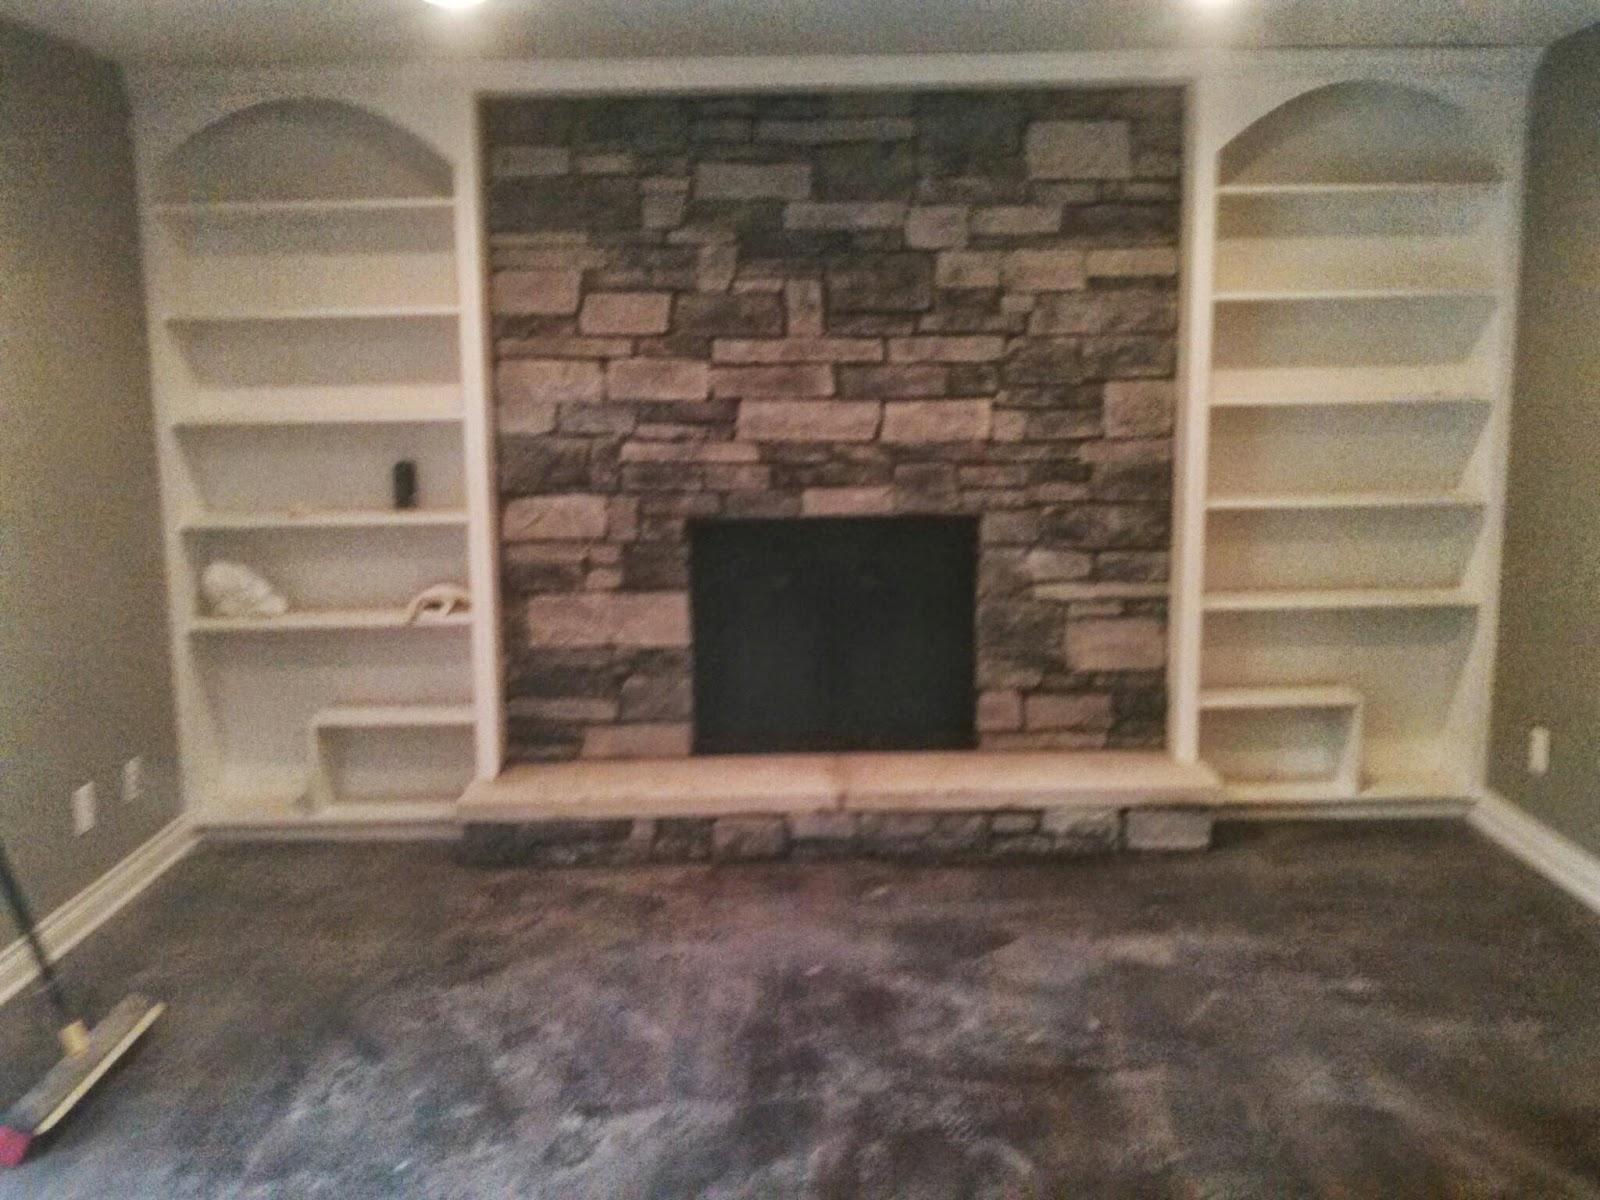 Enjoyable Clarkston Fireplaces Repair 313 355 3719 Download Free Architecture Designs Grimeyleaguecom